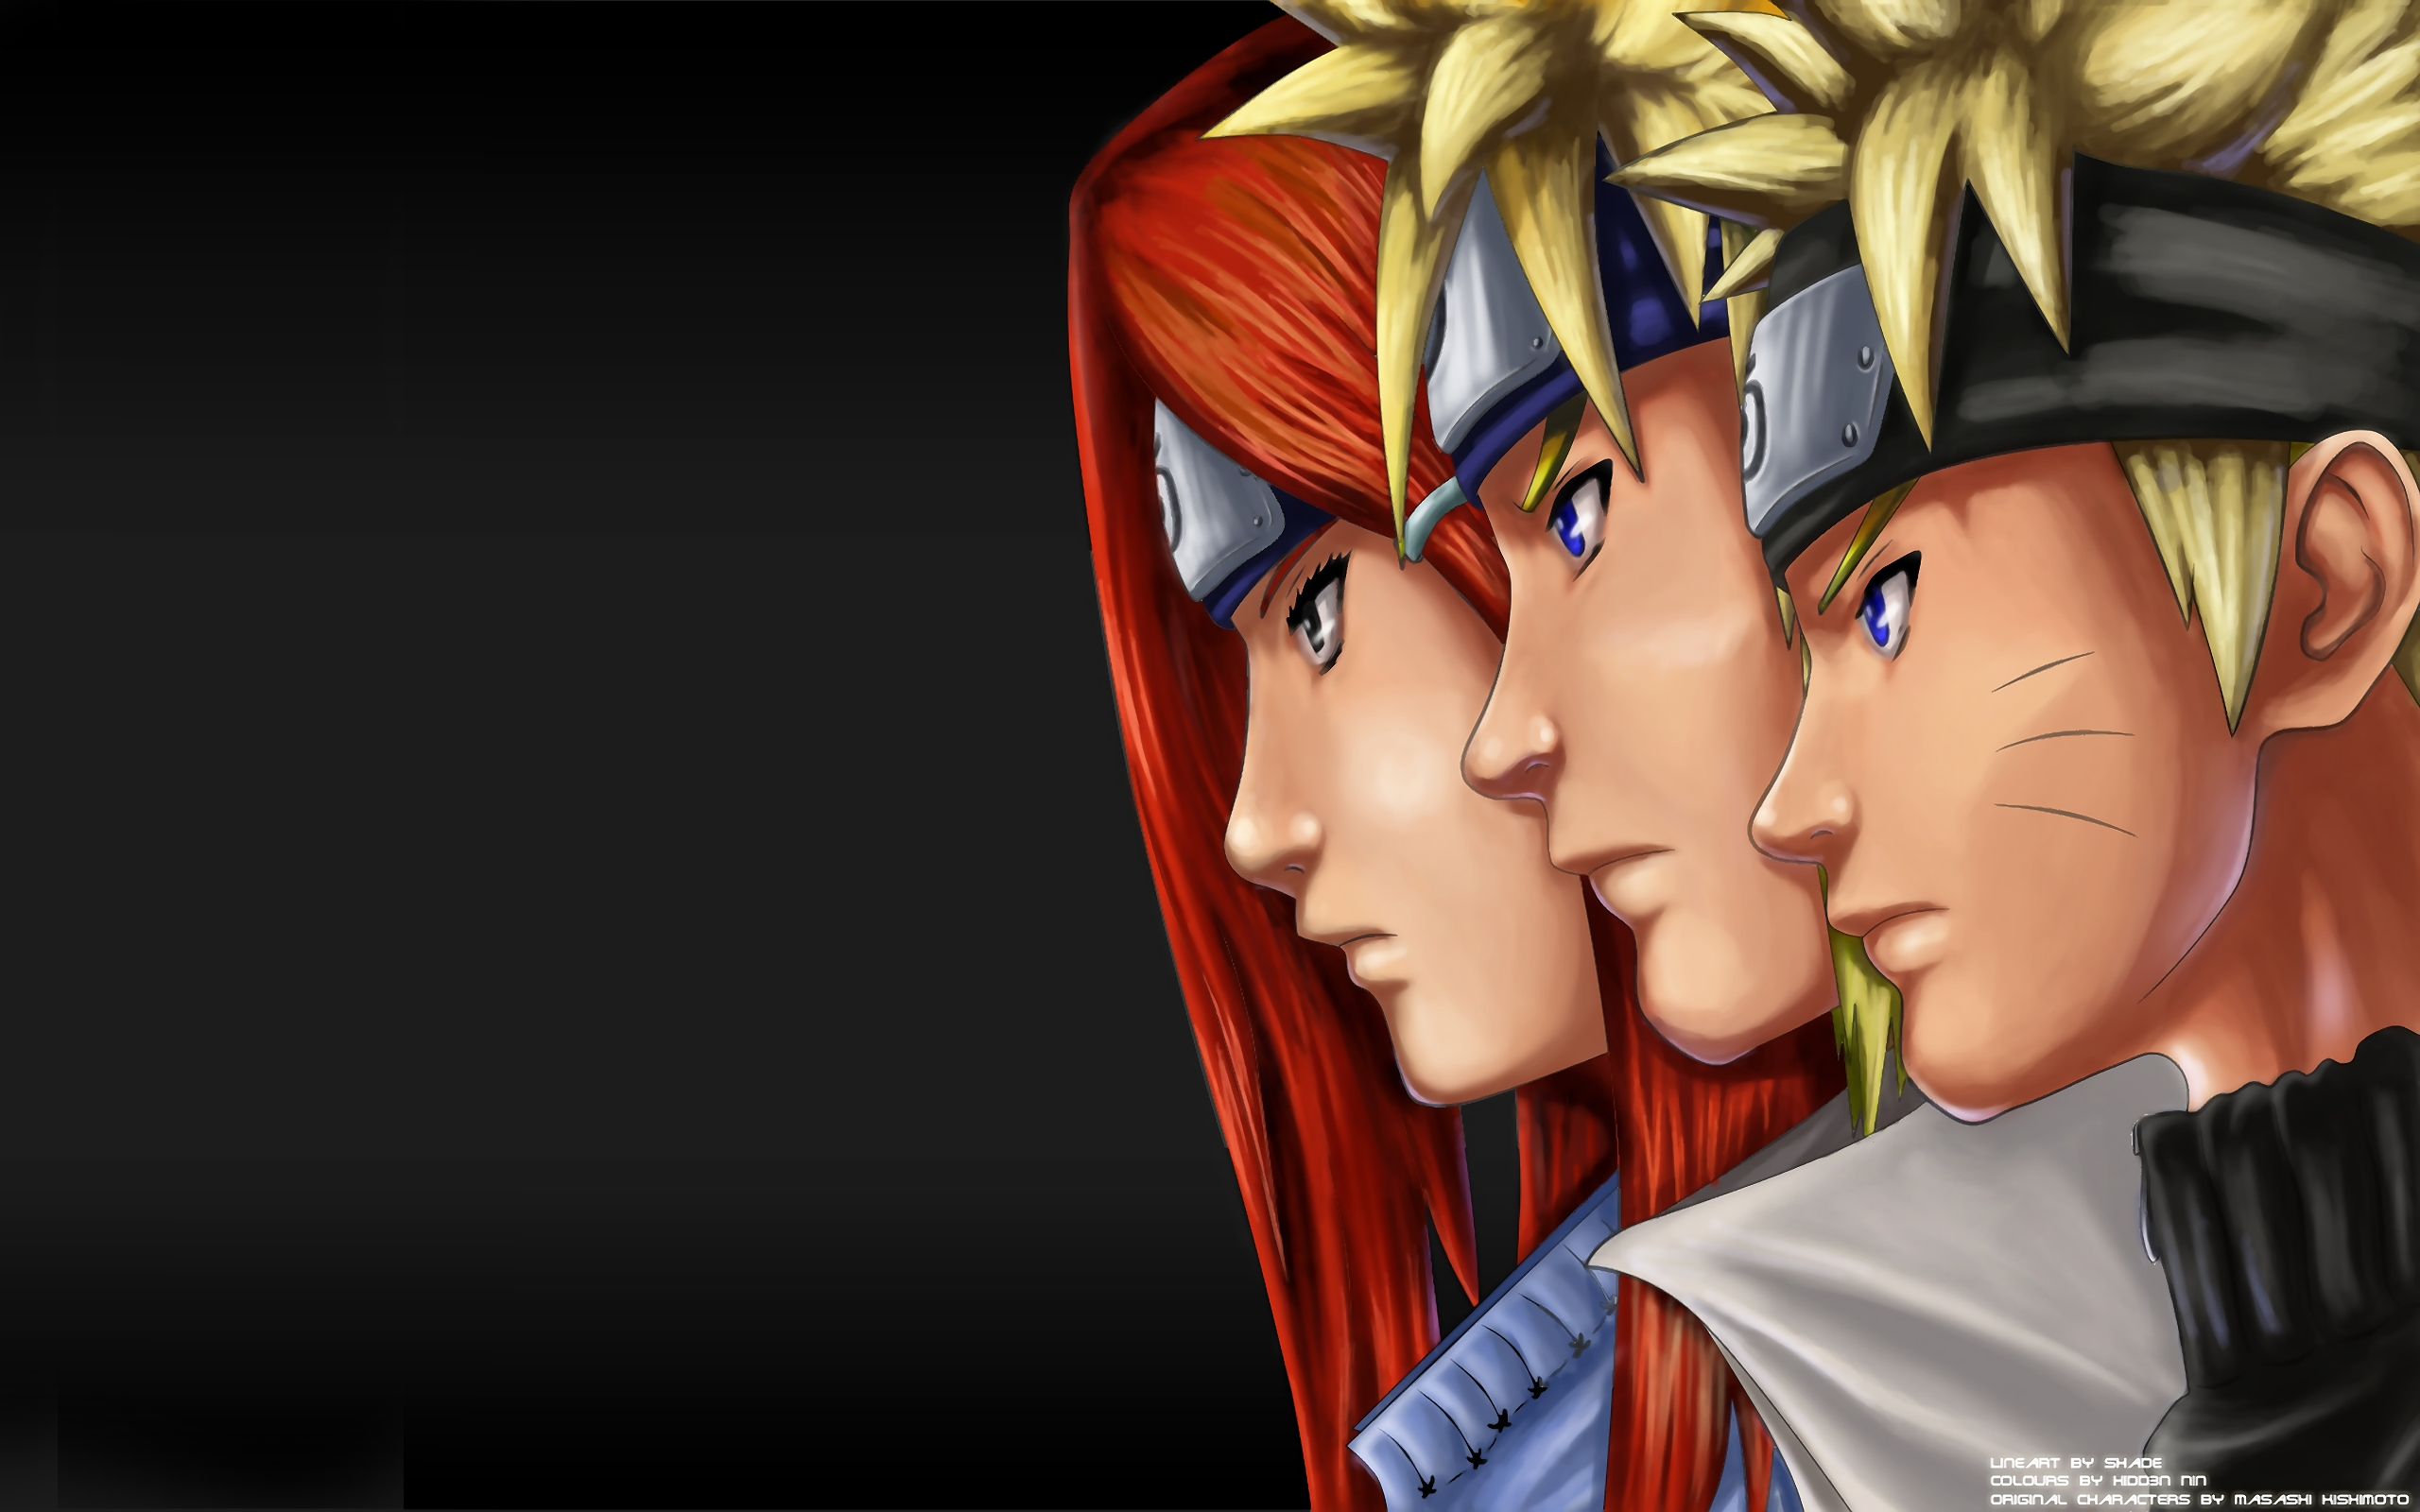 Personajes de Naruto - 2560x1600